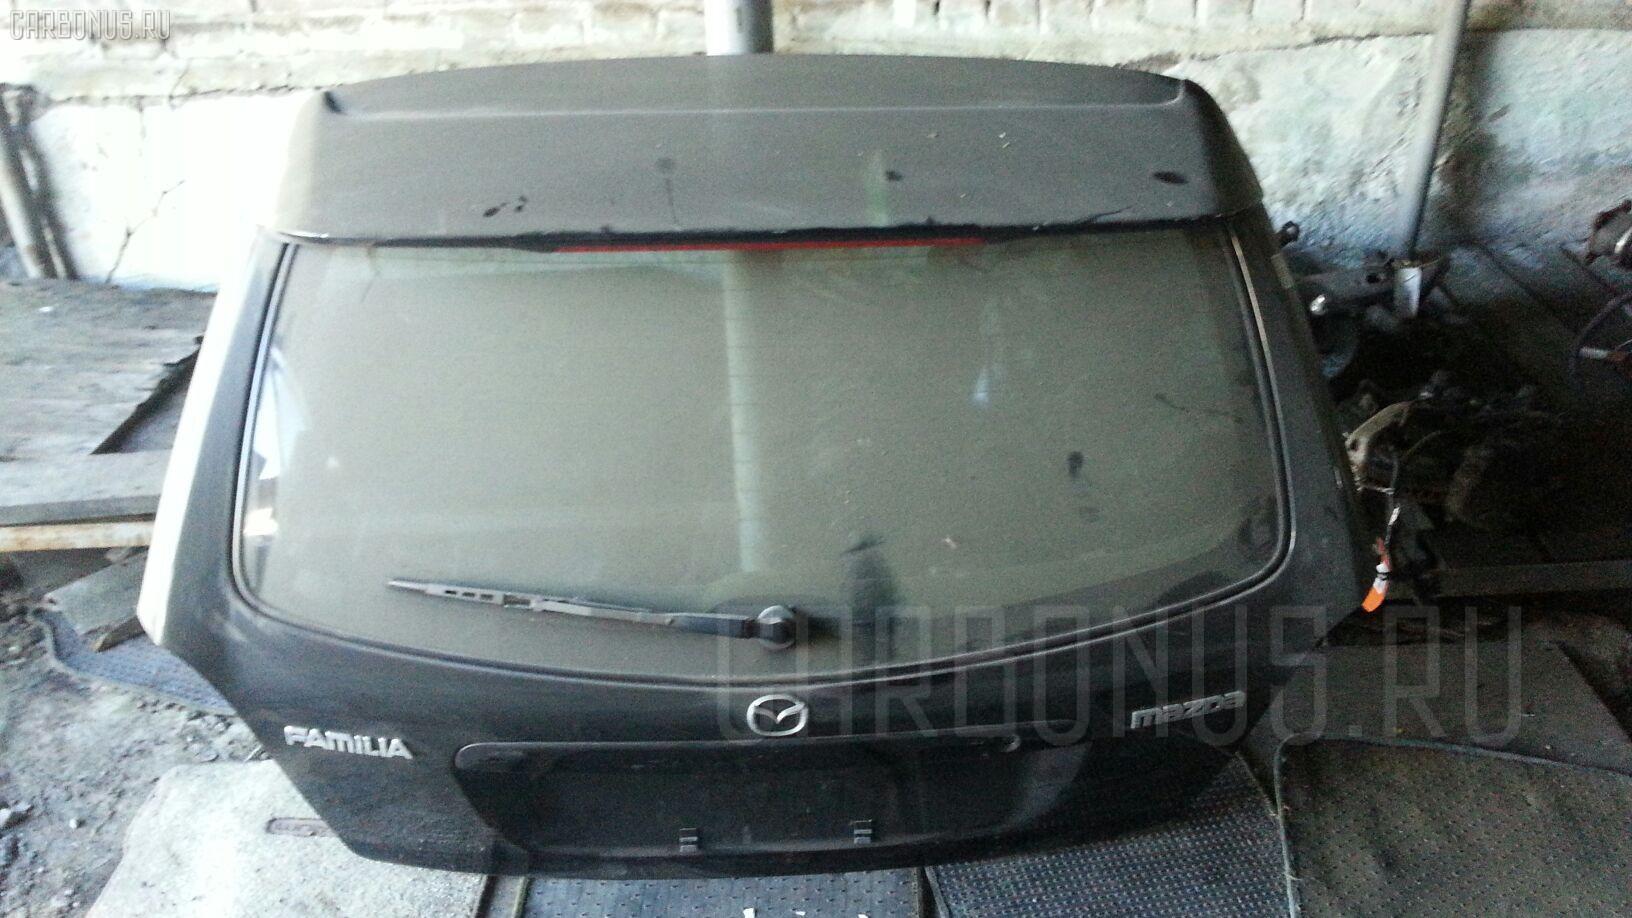 Дверь задняя Mazda Familia s-wagon BJ5W Фото 1